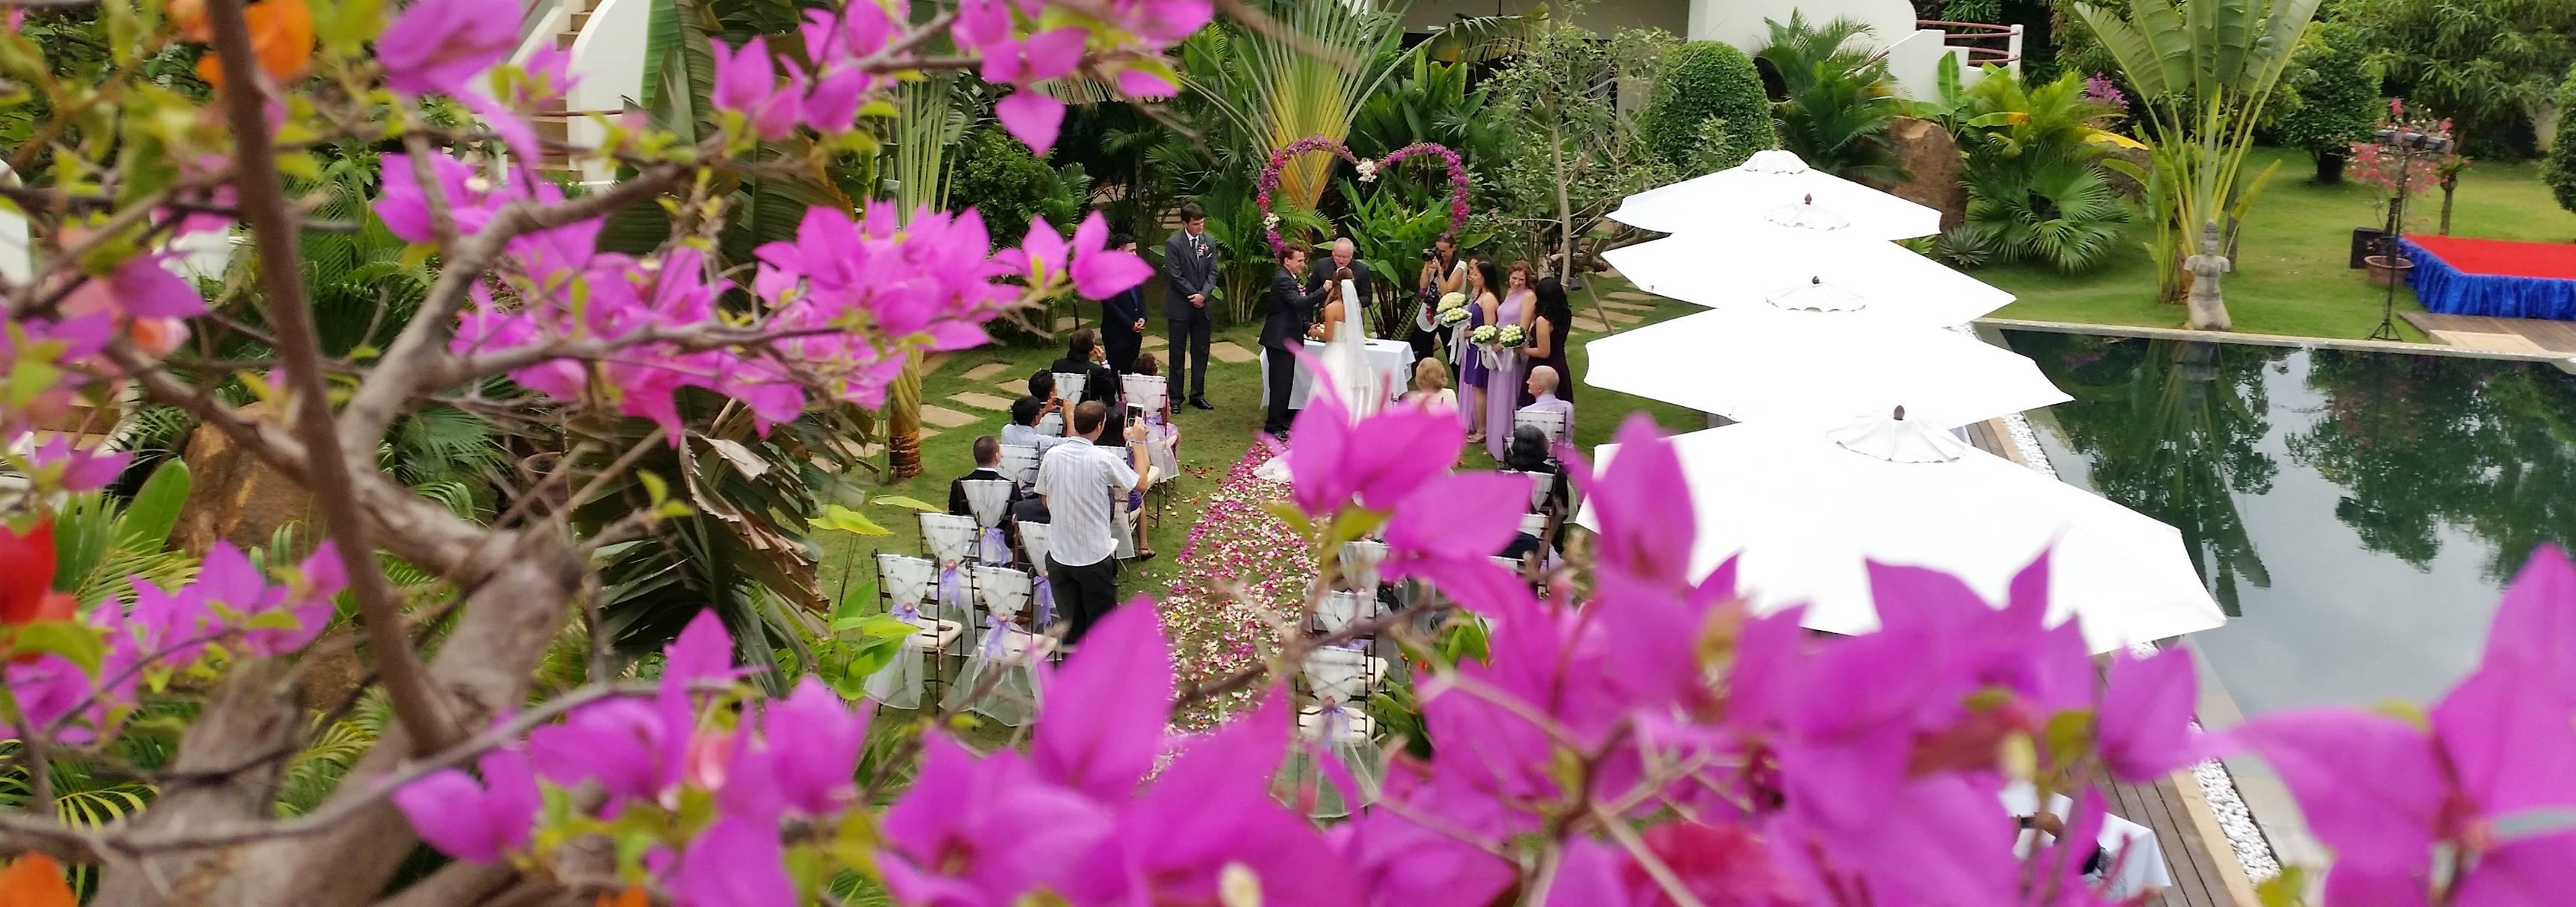 navutu-dreams-resort-and-wellness-retreat-center-krong-siem-reap-cambodia-9